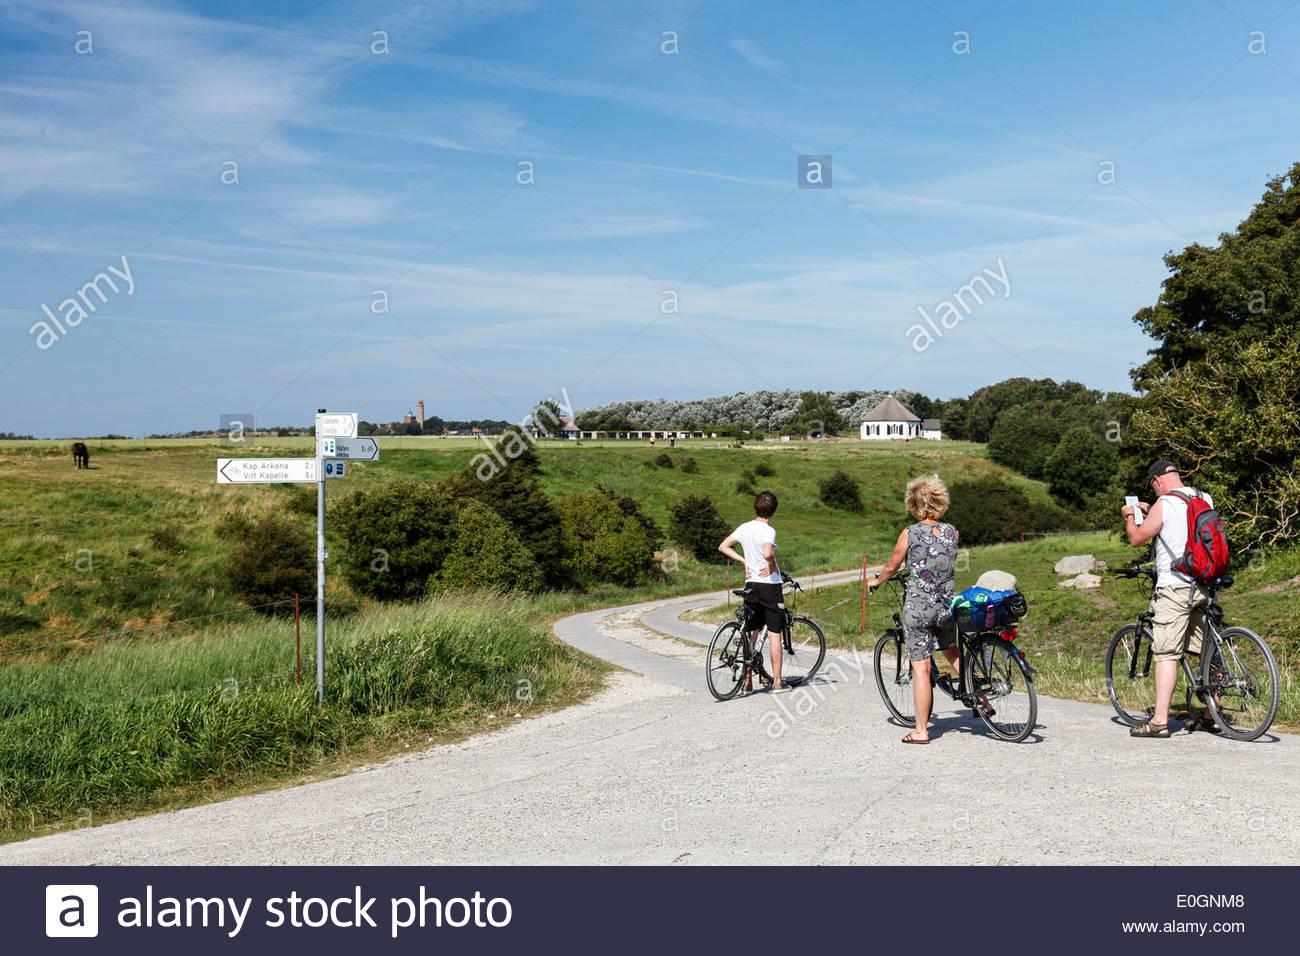 Karte Ostsee Deutschland.Cyclicts Lesung Karte Vitt Kap Arcona Insel Rügen Mecklenburg